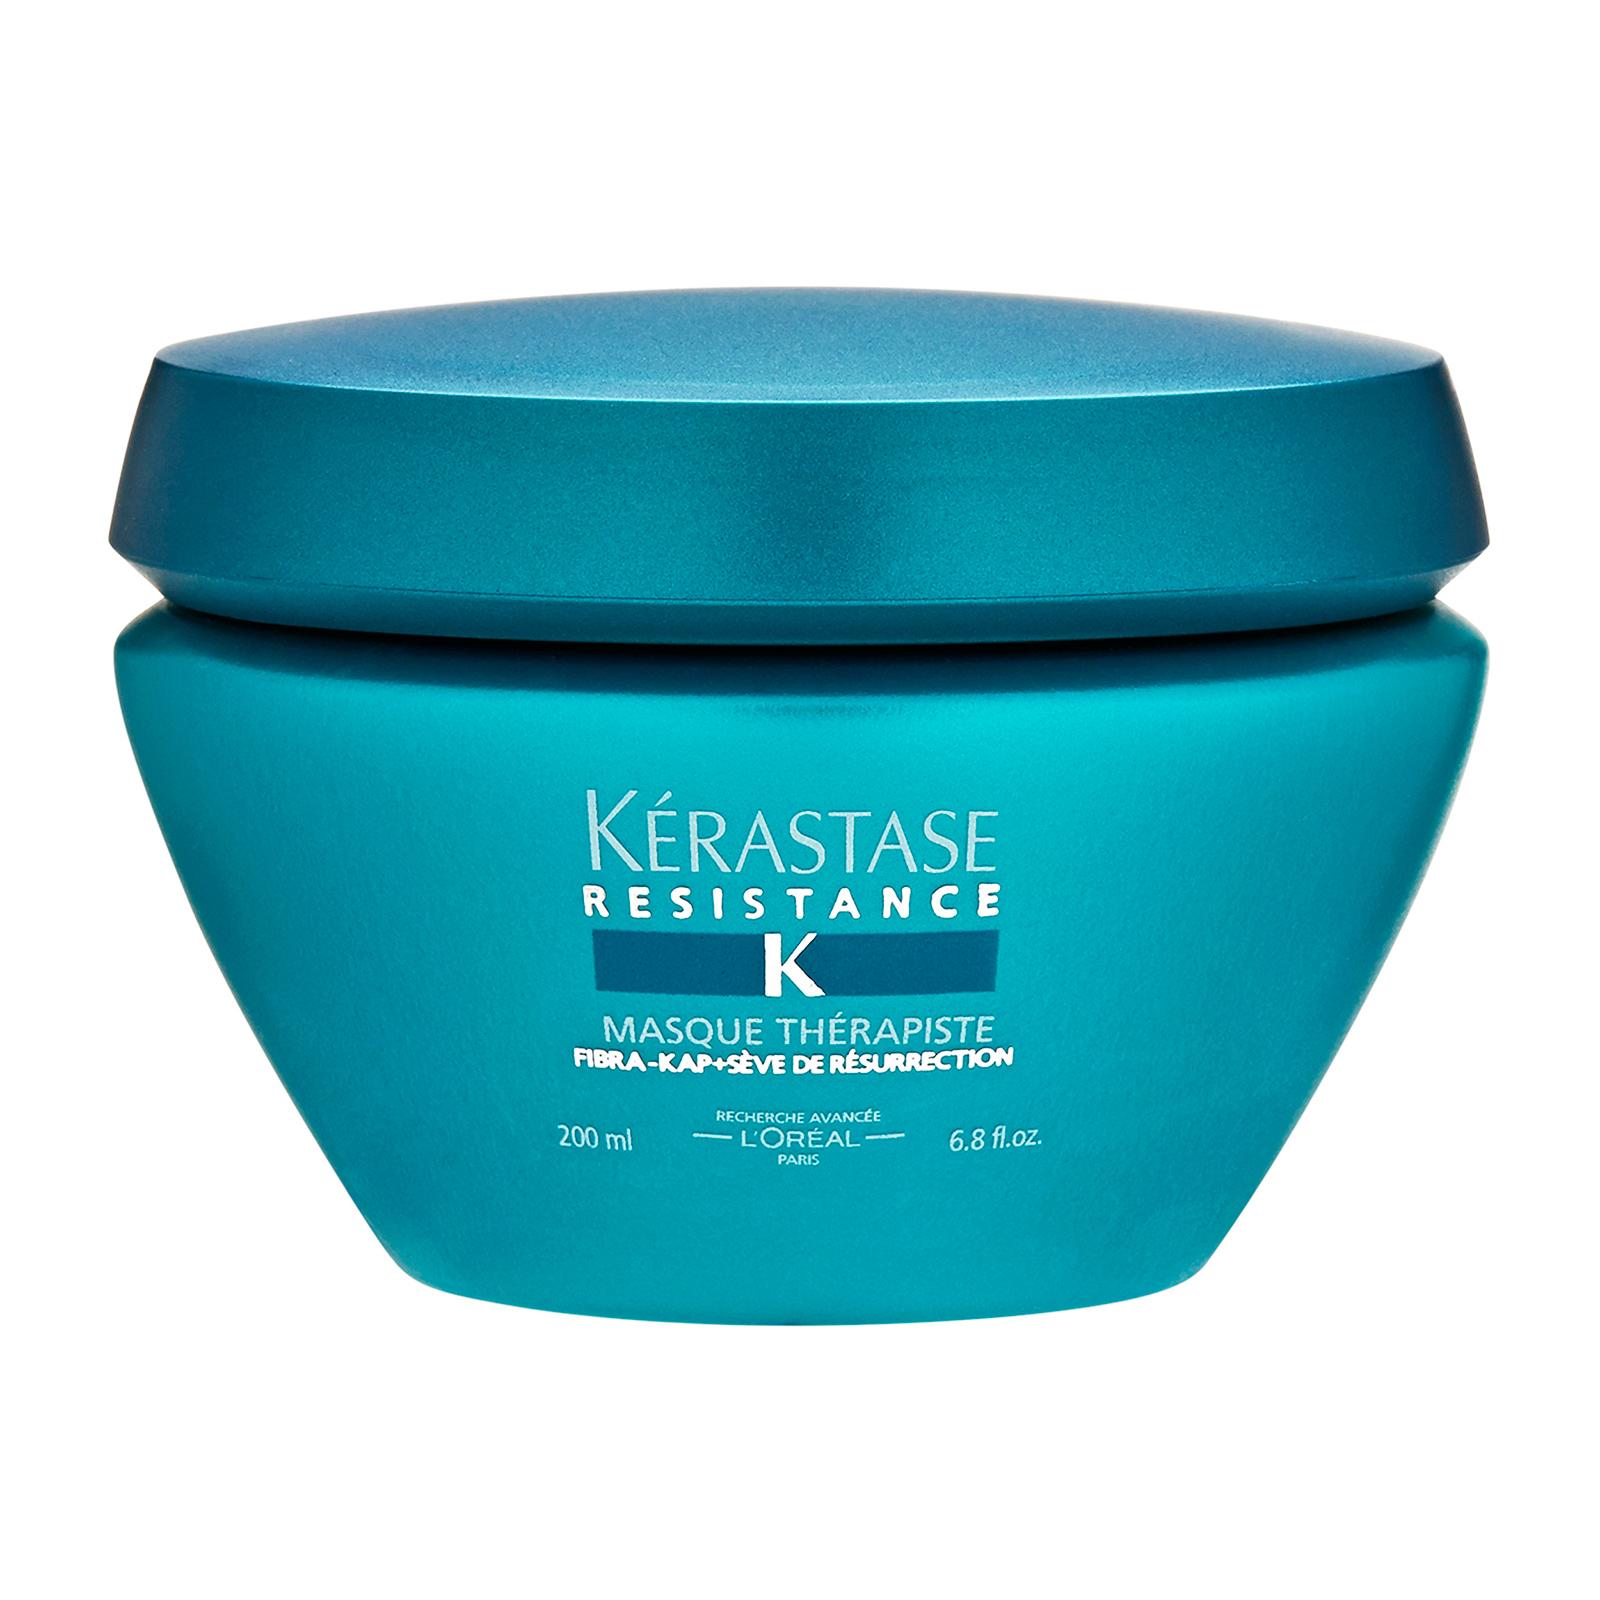 Kérastase Paris Resistance  Masque Therapiste Fiber Quality Renewal Masque (Very Damaged, Over-Processed Thick Hair) 6.8oz, 200ml